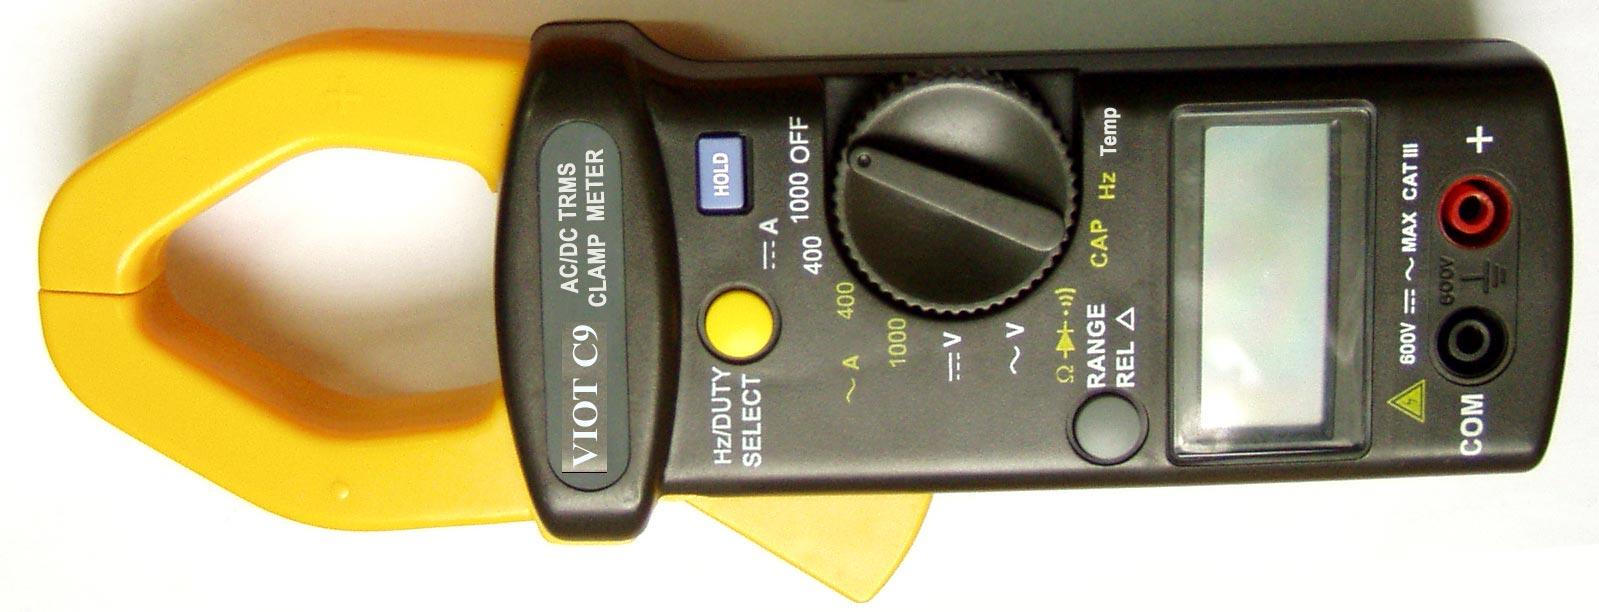 ACDC True RMS Clamp Meter Ammeter Multimeter WCapacitor Tester - Us zip code type